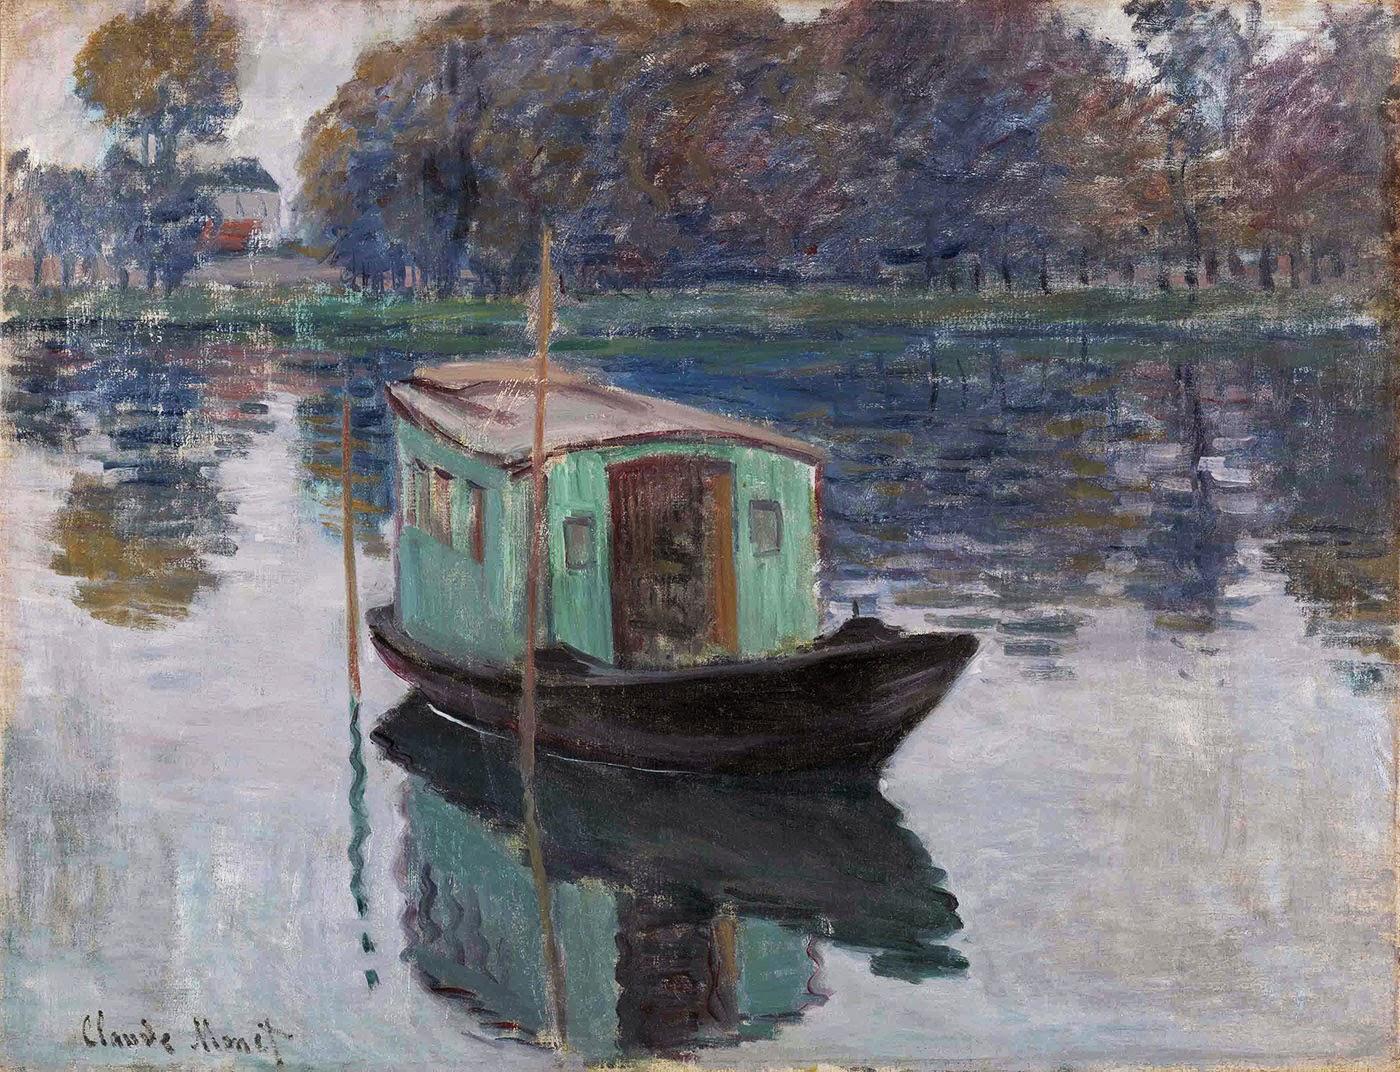 Claude Monet, El barco-taller (1874), Kröller-Mullër Museum, Otterlo